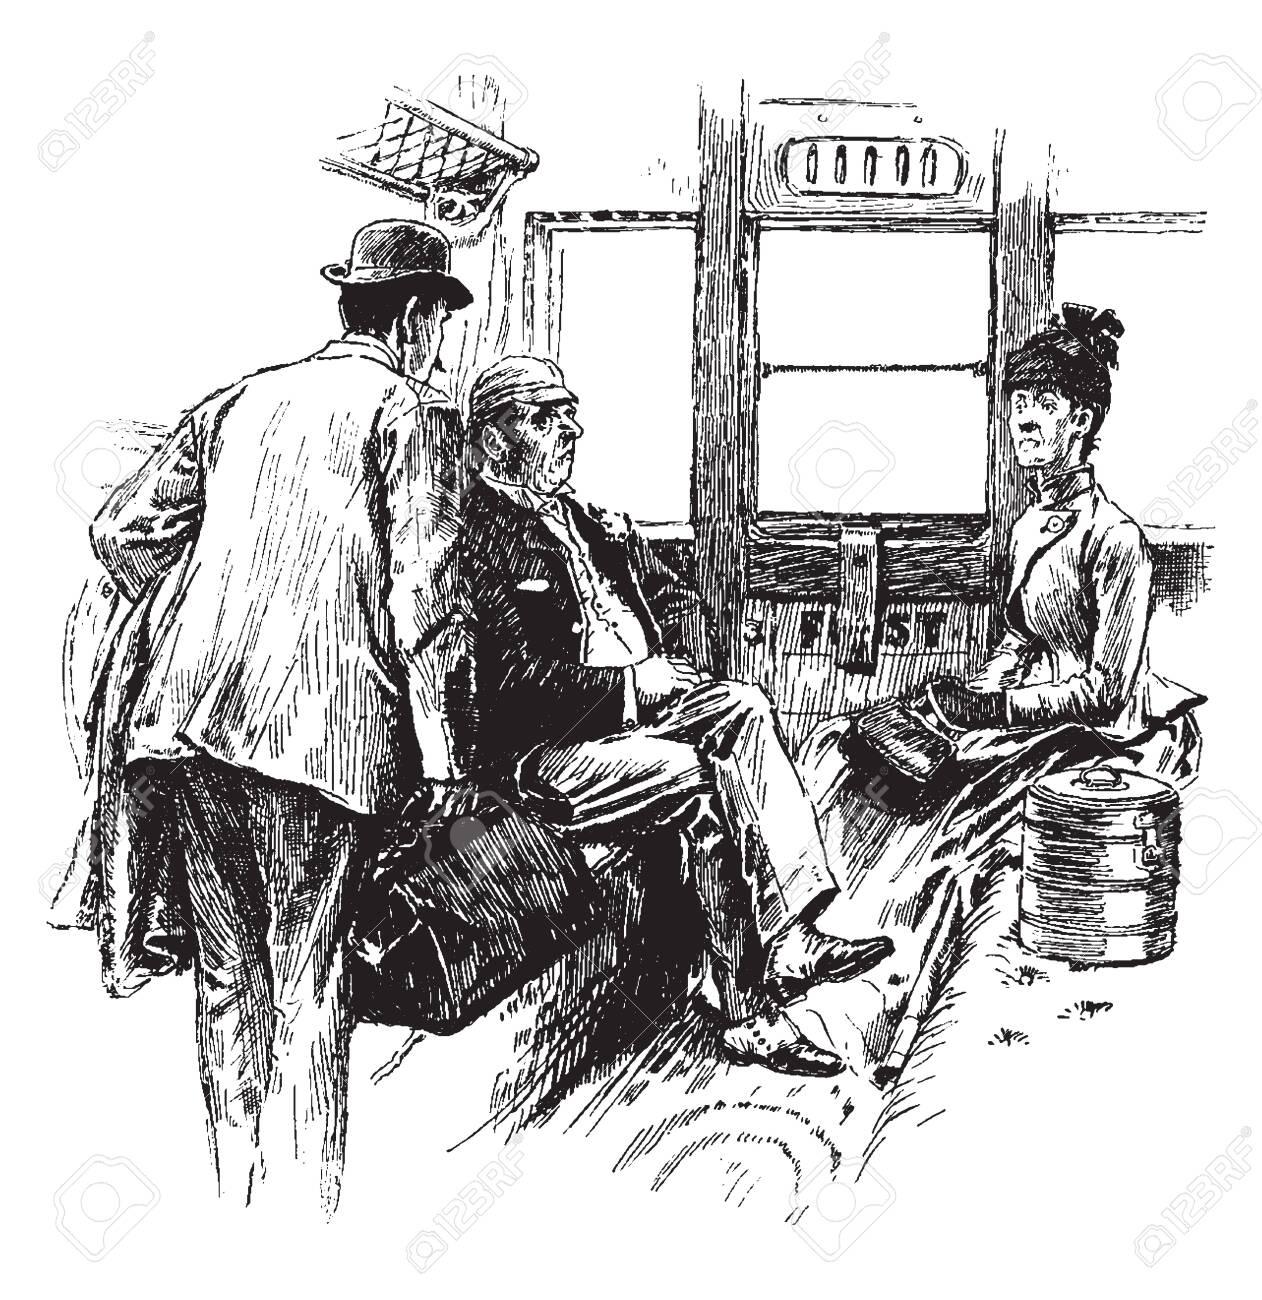 Traveling Selfishly would seem to have a distinctly selfish tendency, vintage line drawing or engraving illustration. - 133045180